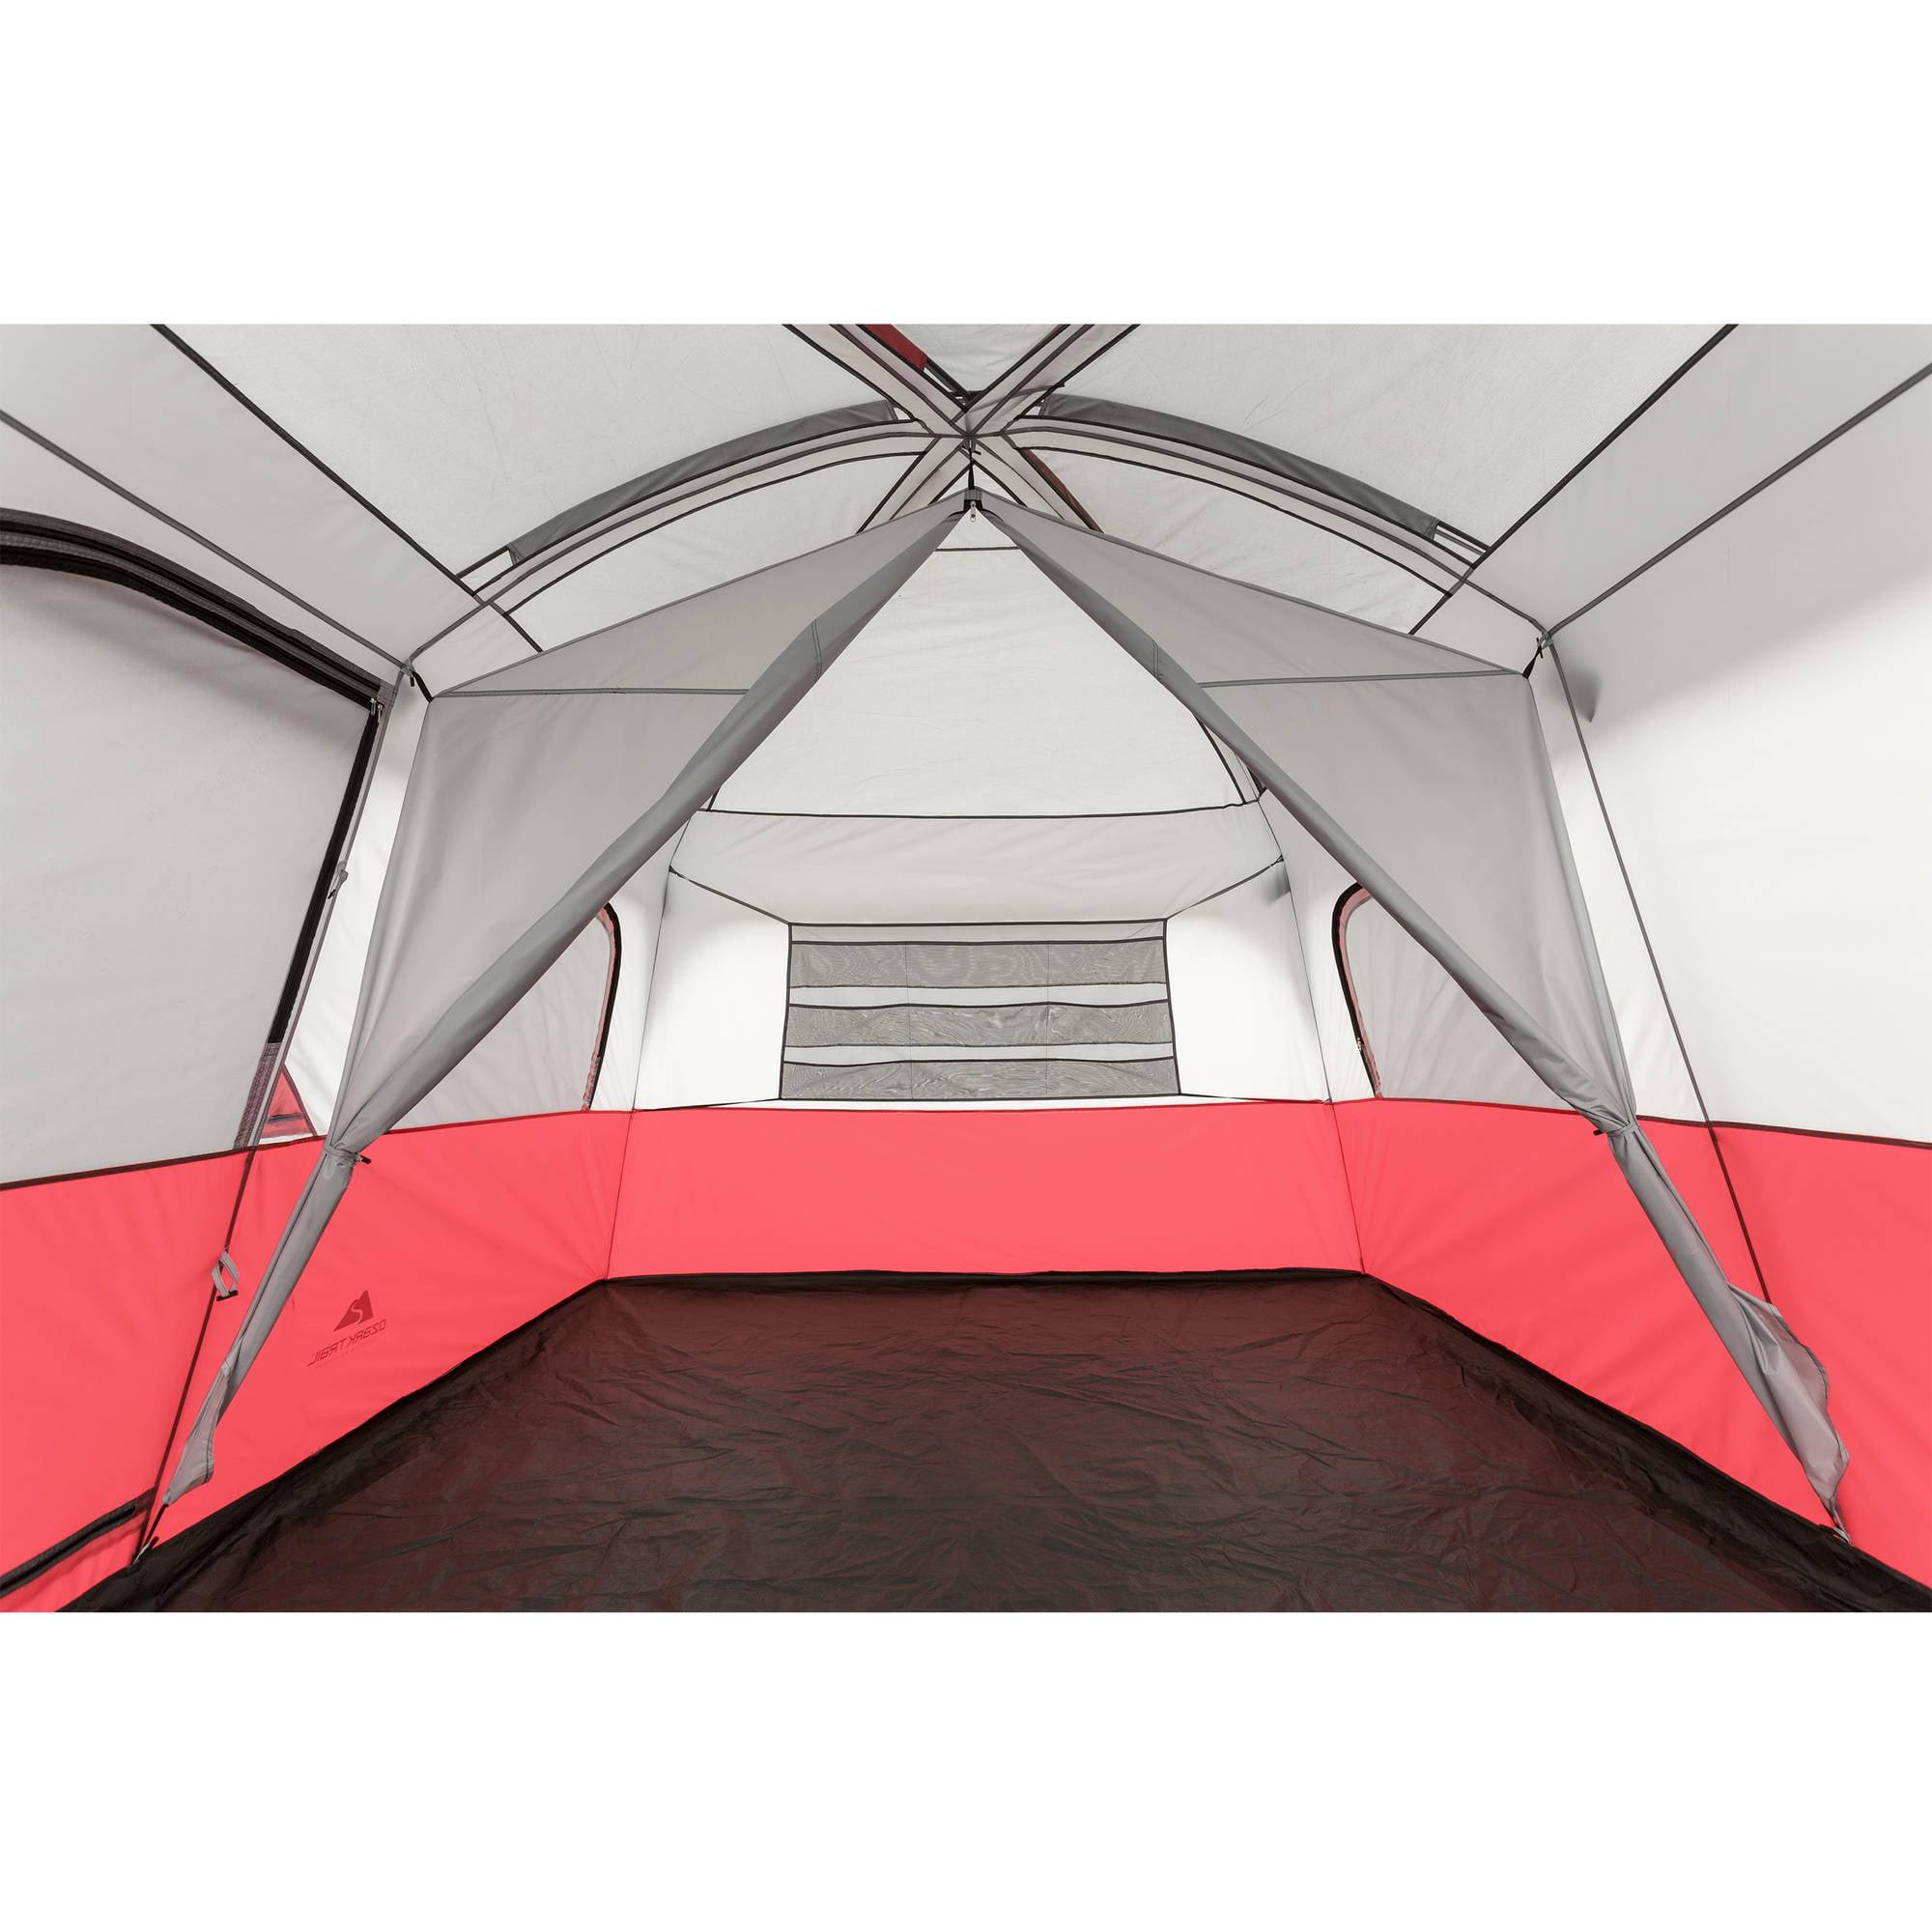 sc 1 st  Walmart & Ozark Trail 10 Person 2 Room Cabin Tent - Walmart.com